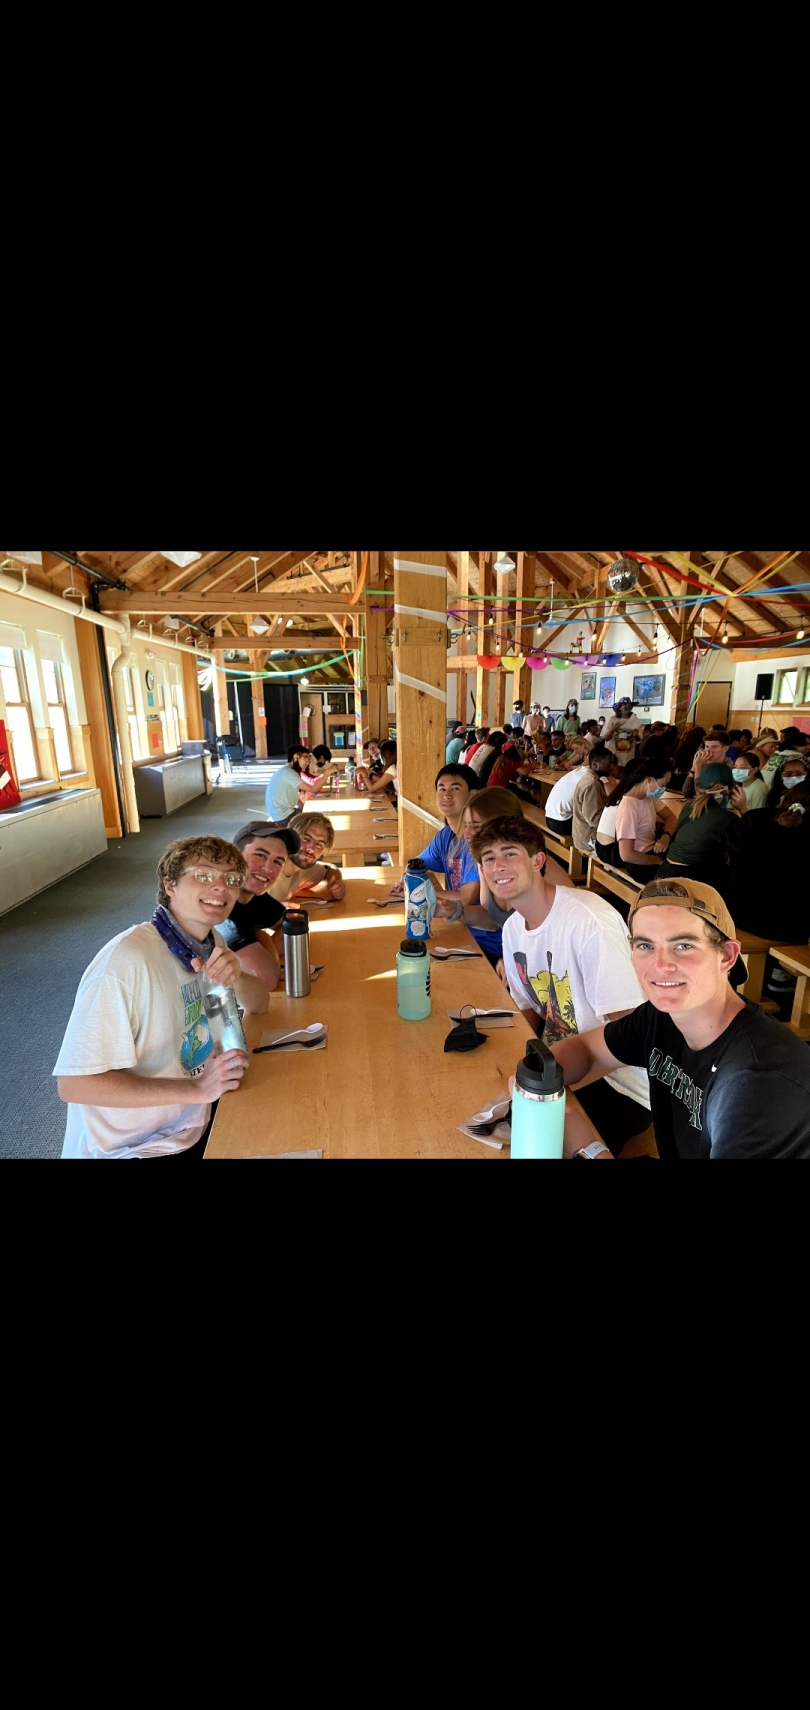 My trip sitting in the Ski-Lodge